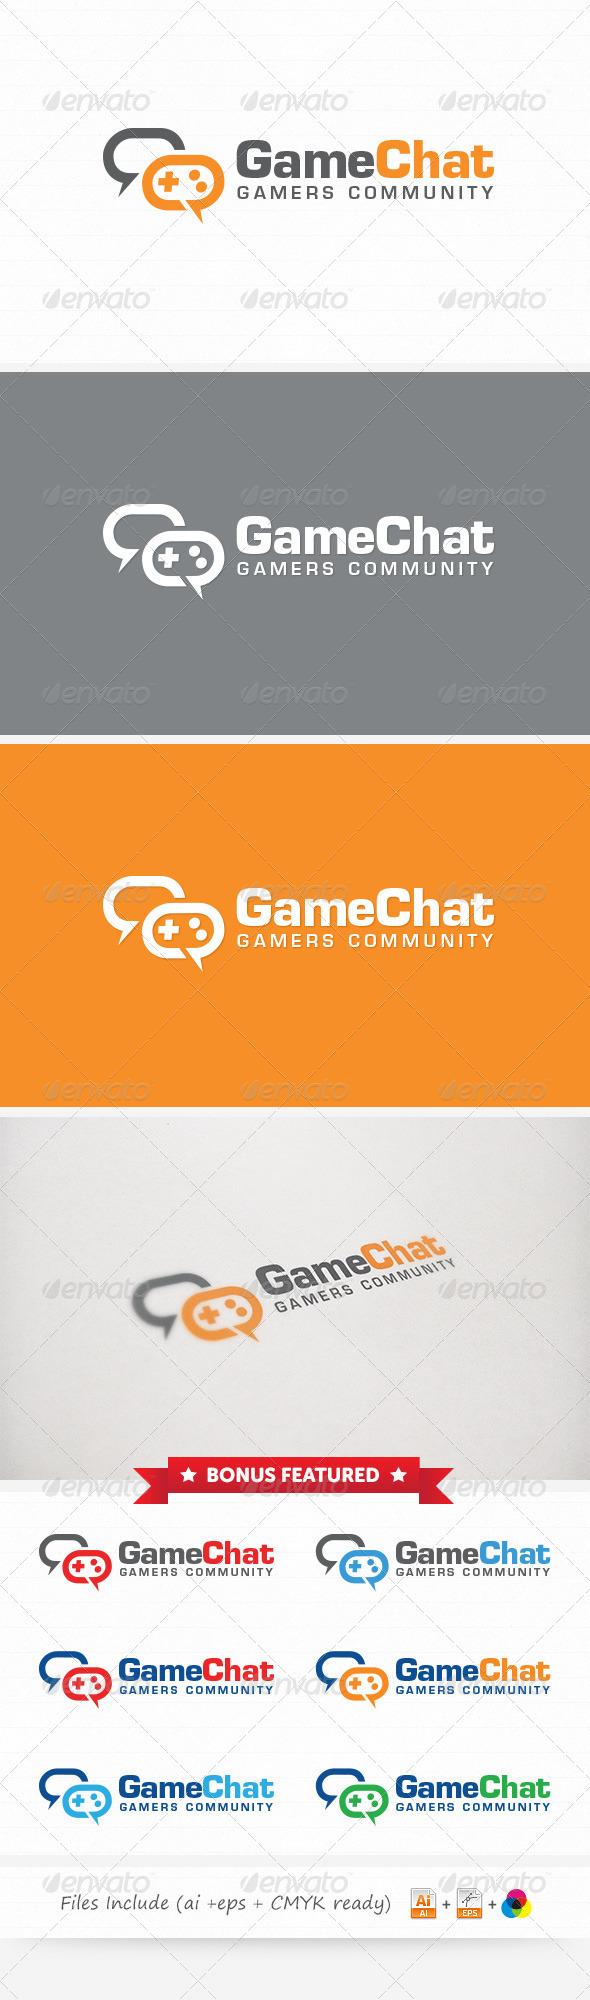 GraphicRiver Game Community Logo 6077696